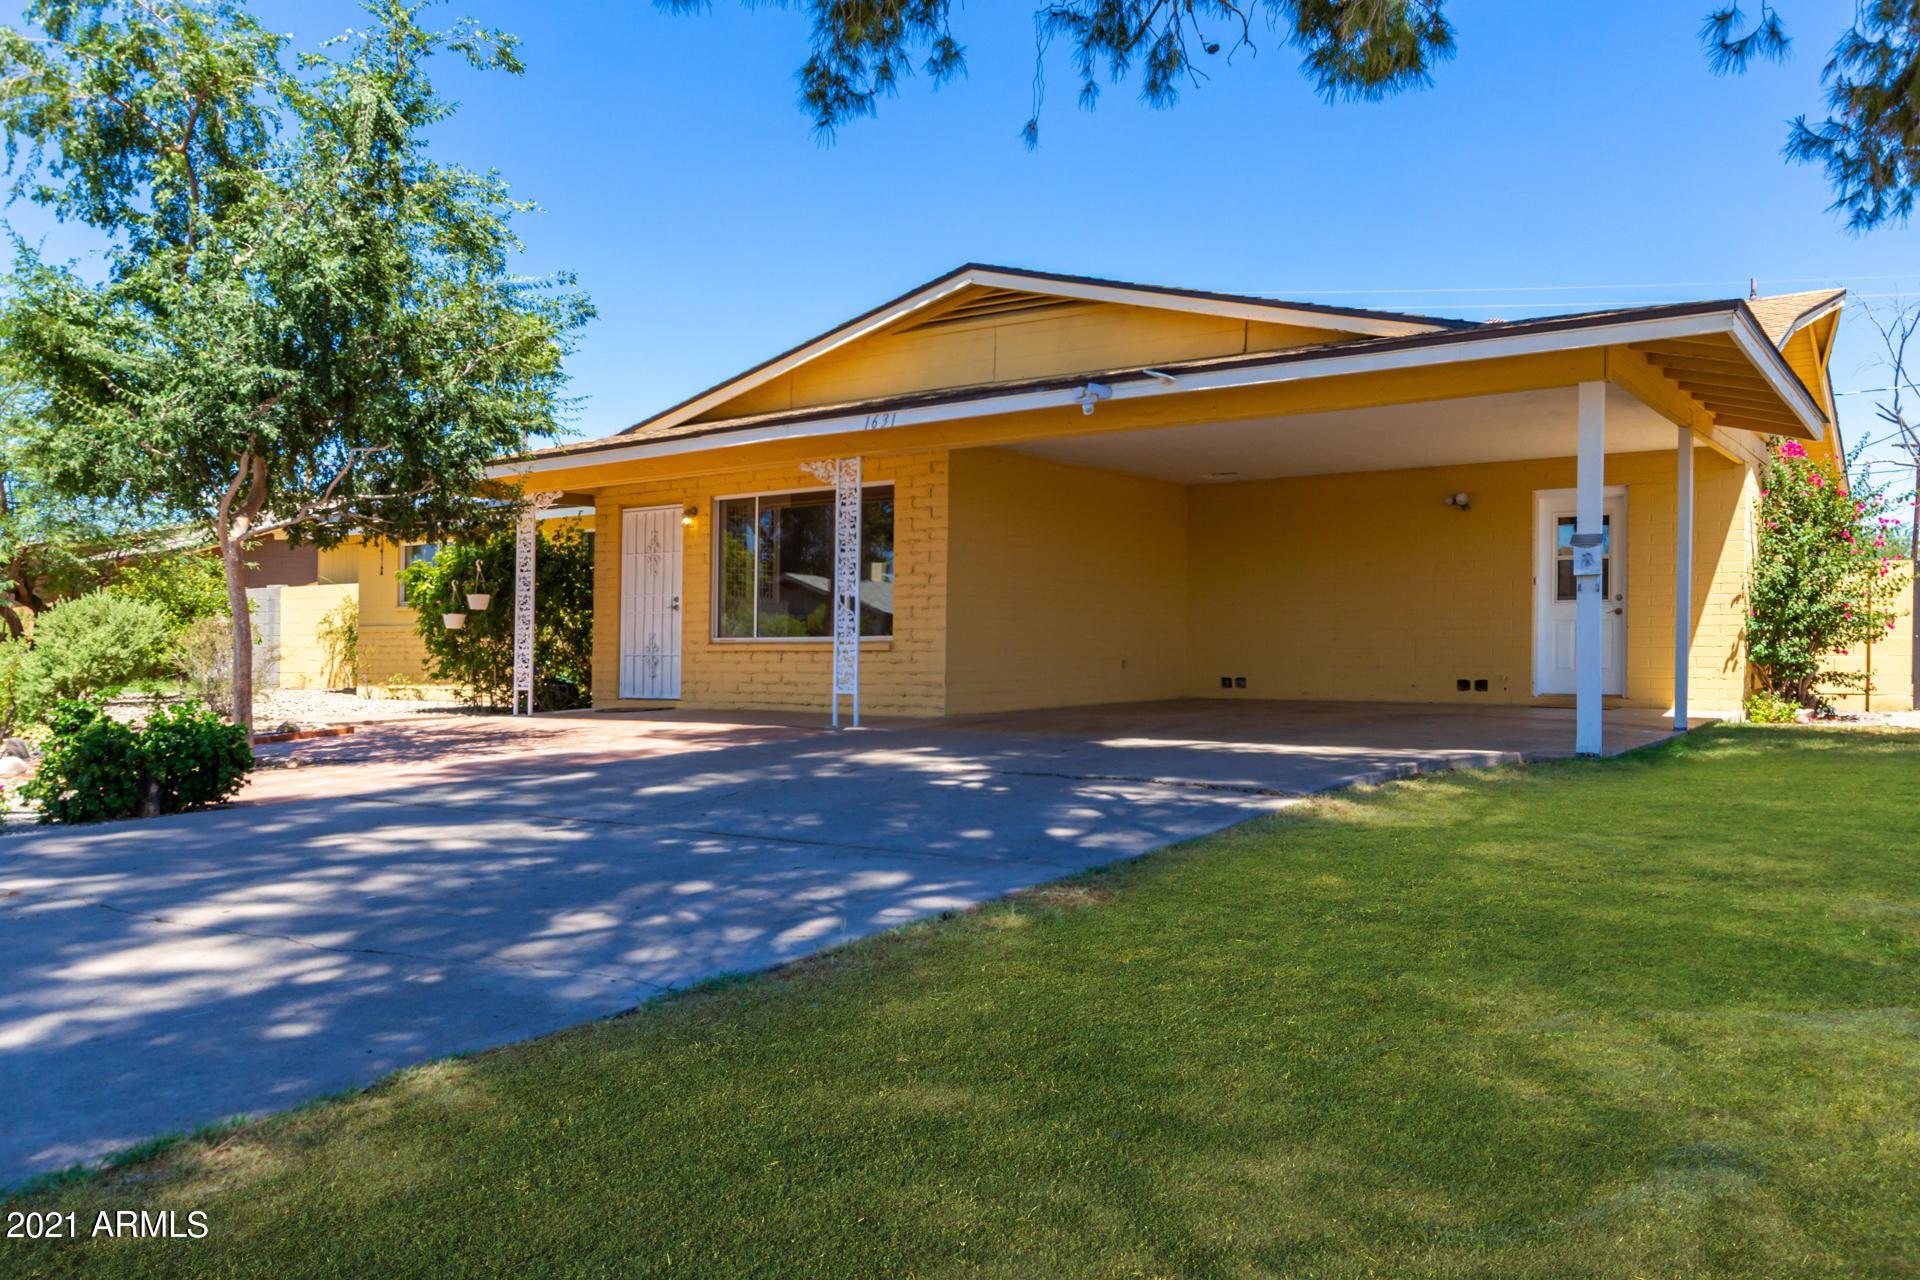 Photo of 1631 N OLD COLONY --, Mesa, AZ 85201 (MLS # 6250026)